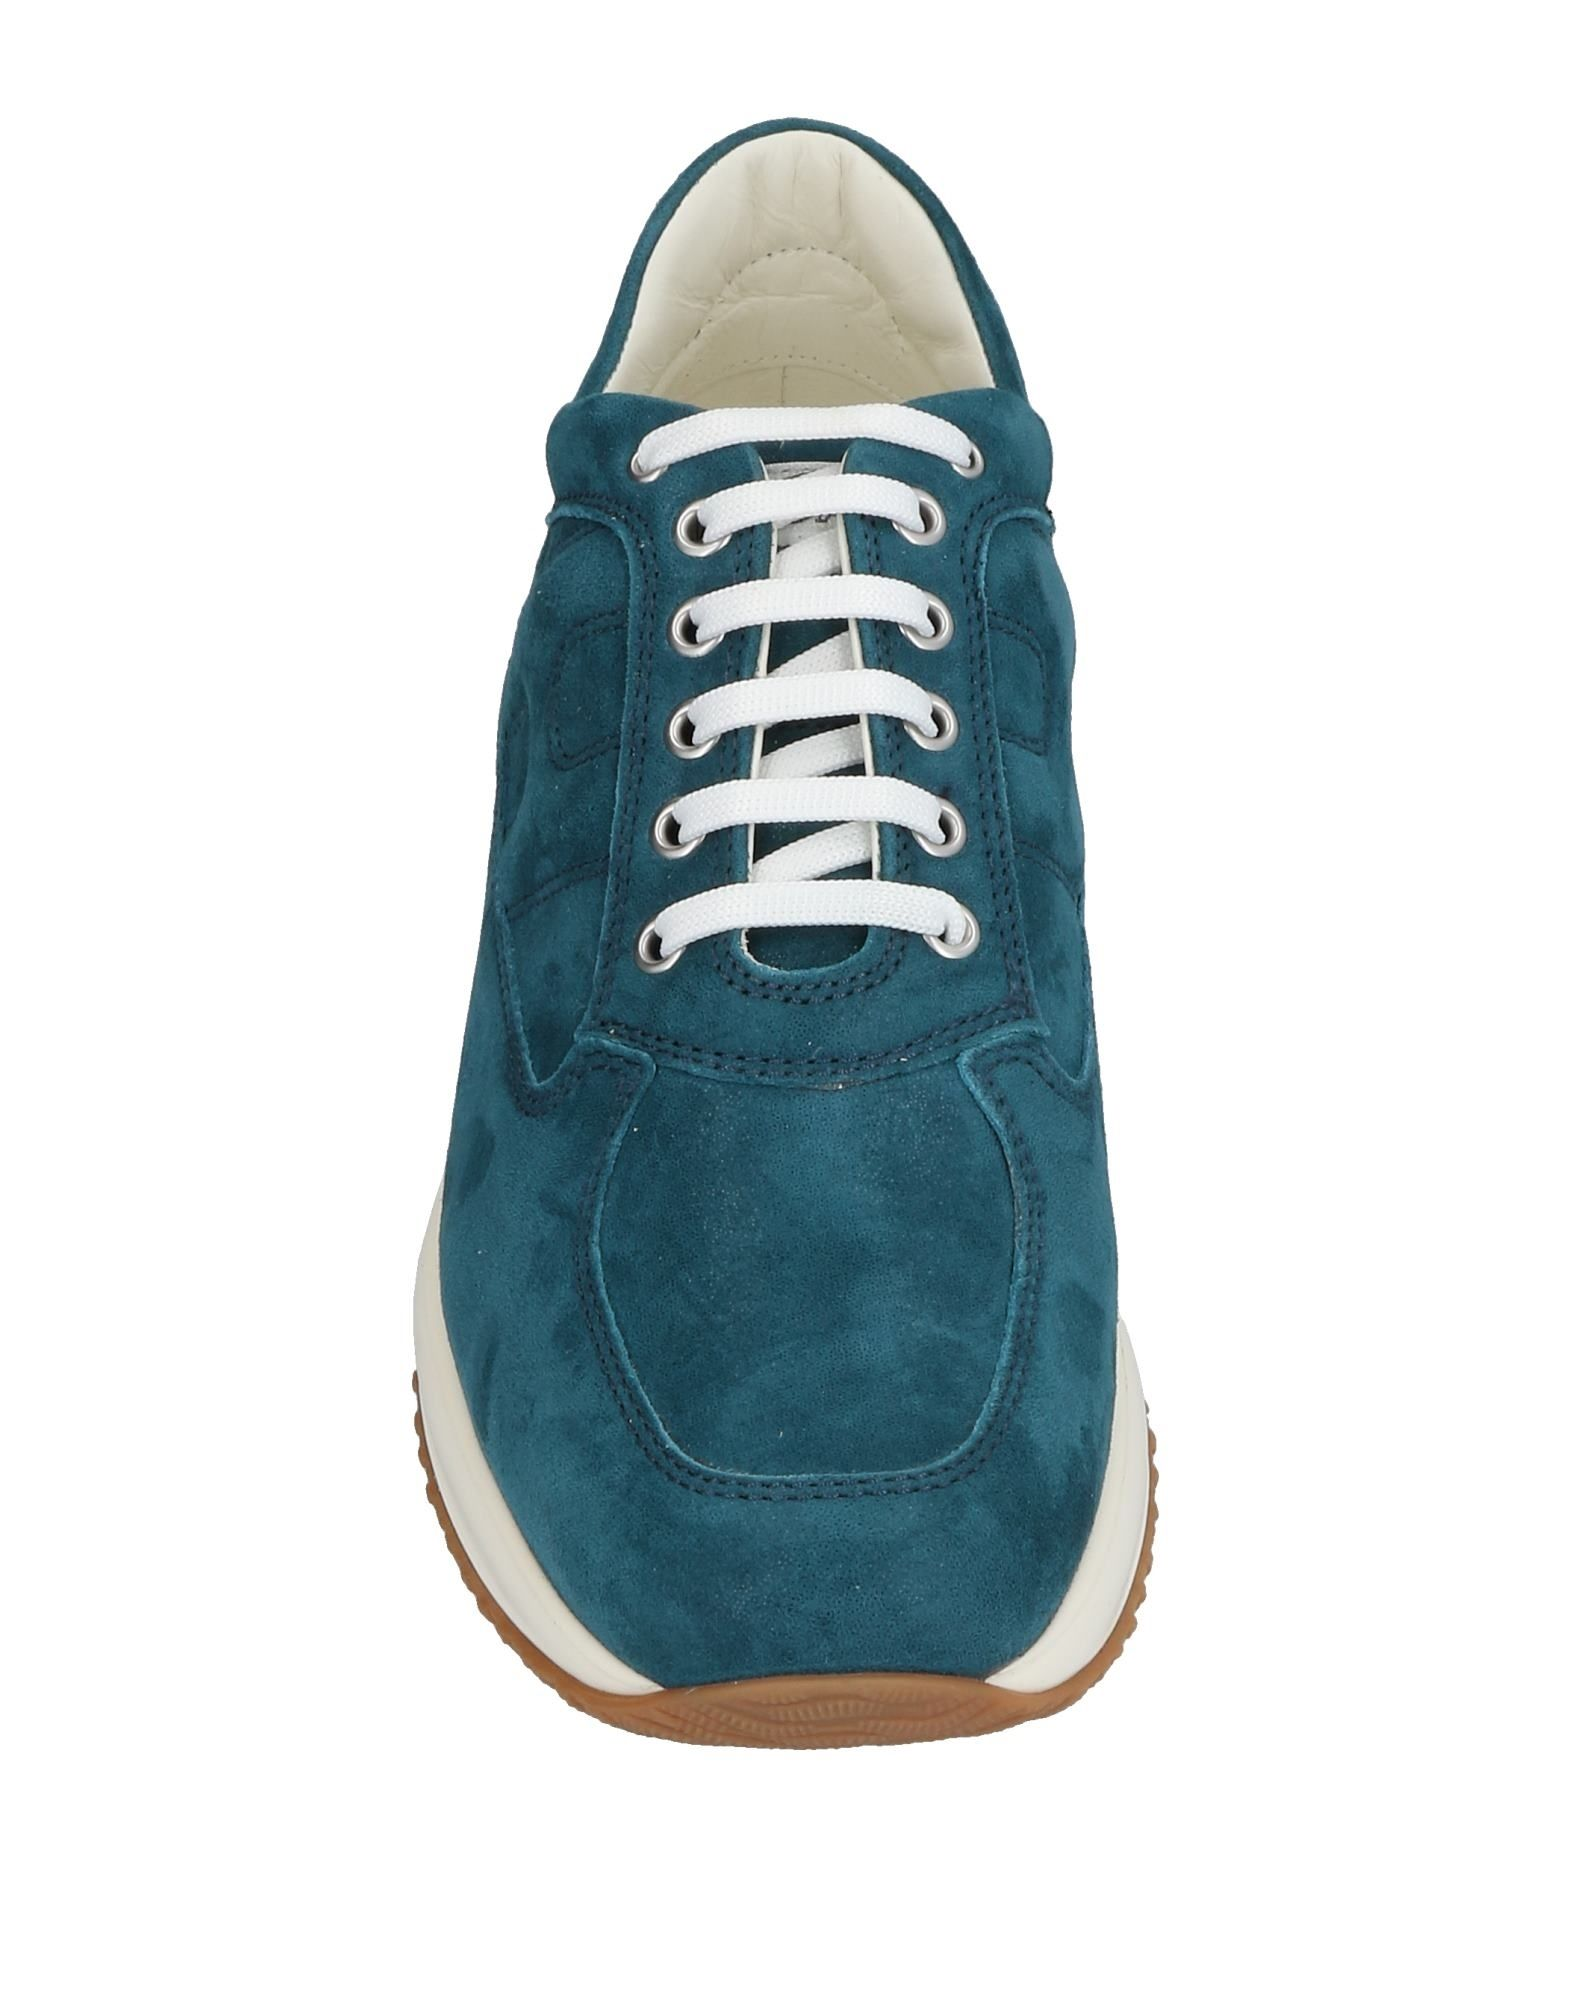 Hogan Sneakers Herren  11438393SU Gute Qualität beliebte Schuhe